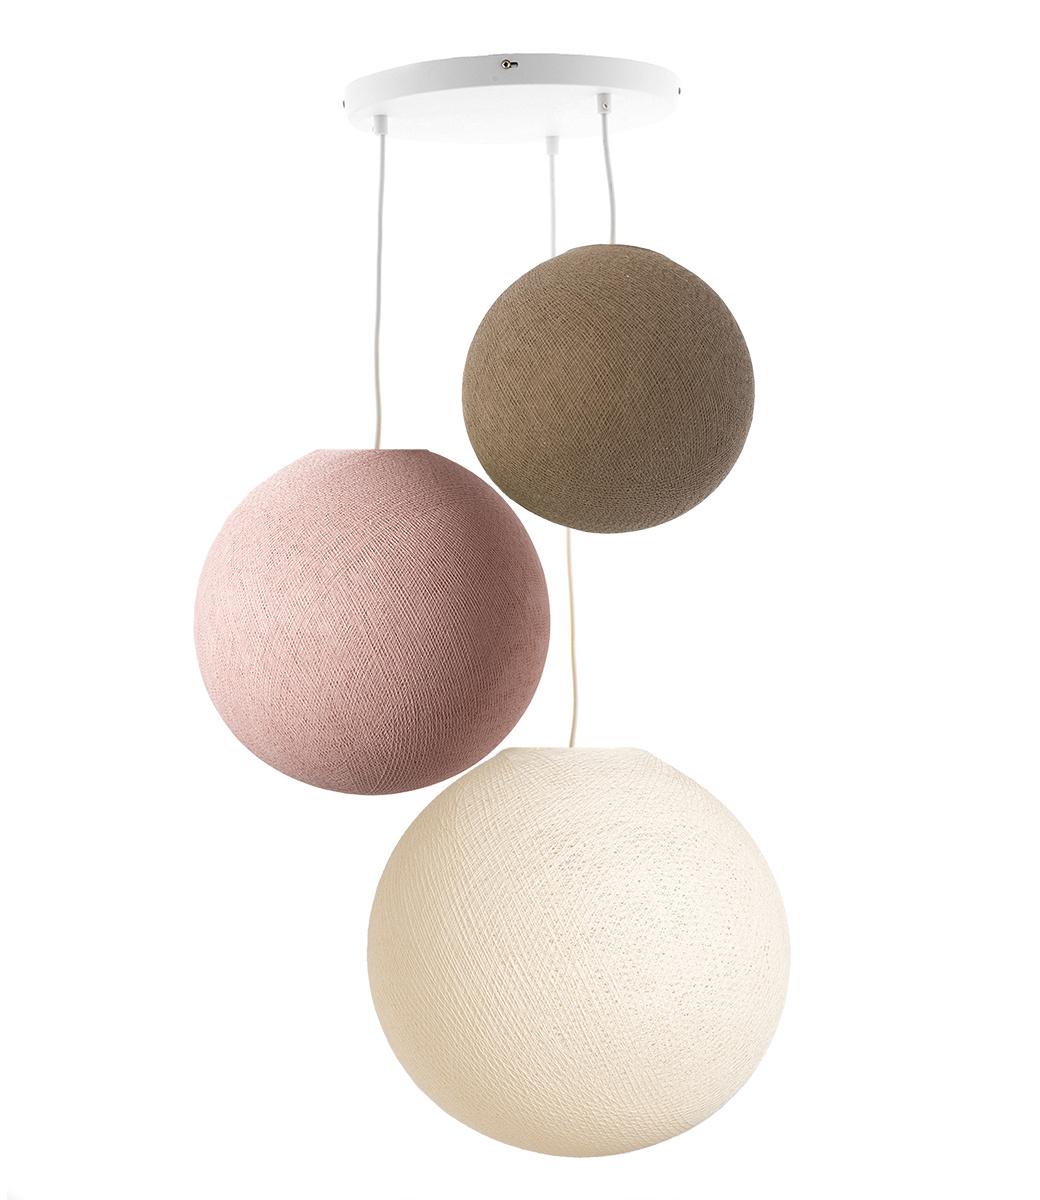 Drievoudige hanglamp 3 punt - Beloved